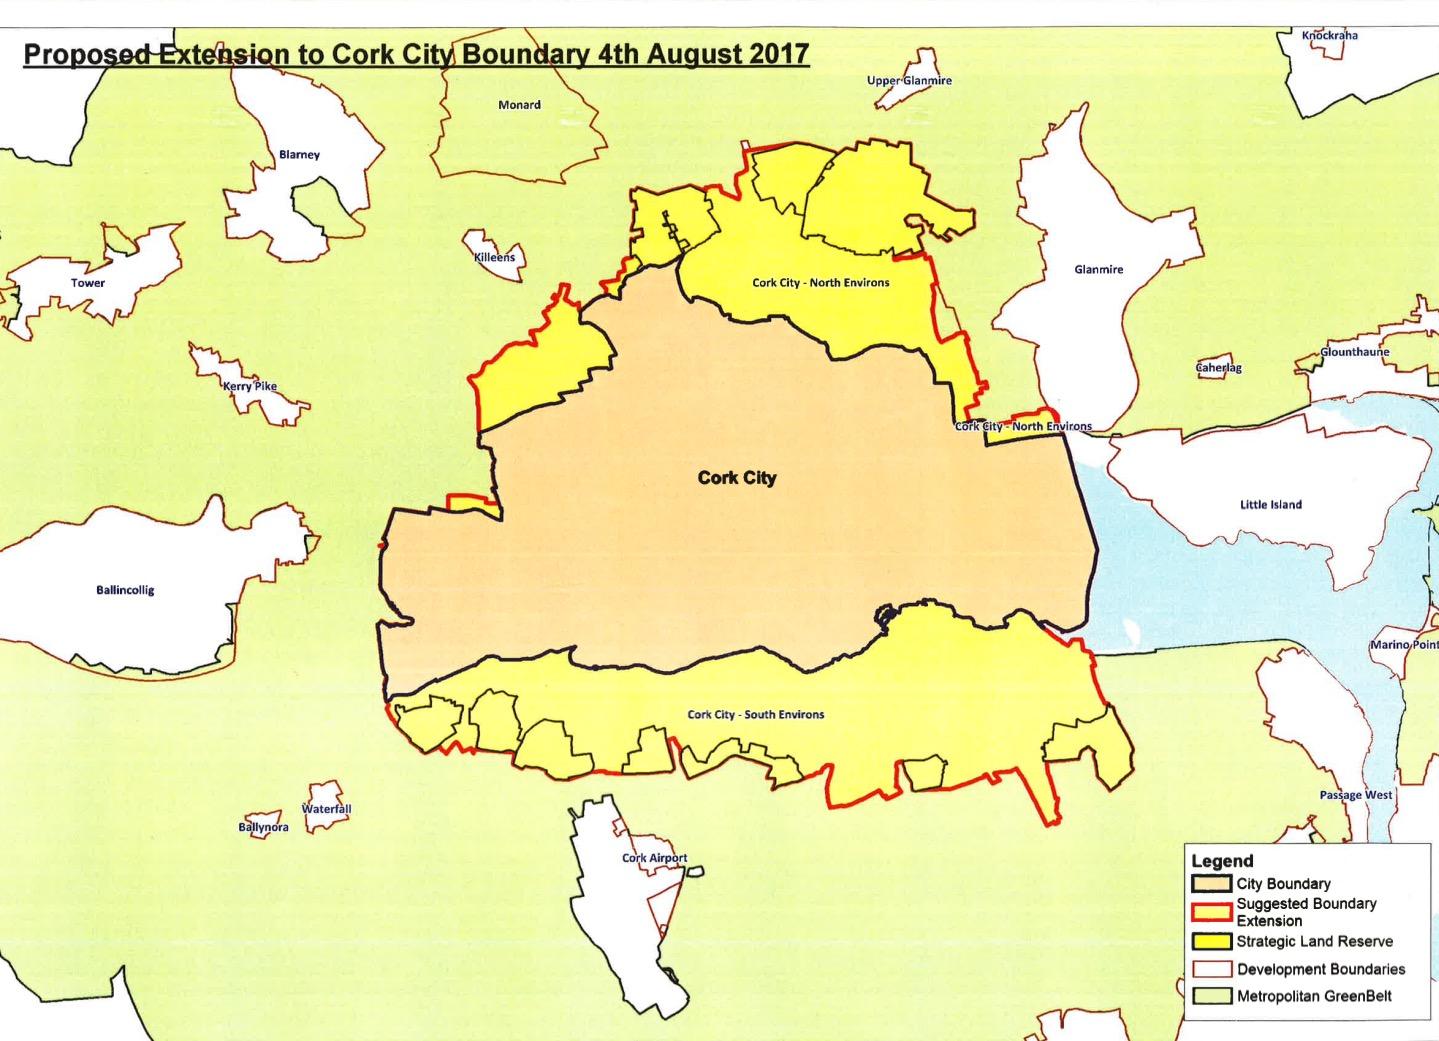 City Council Boundary_04.08.17